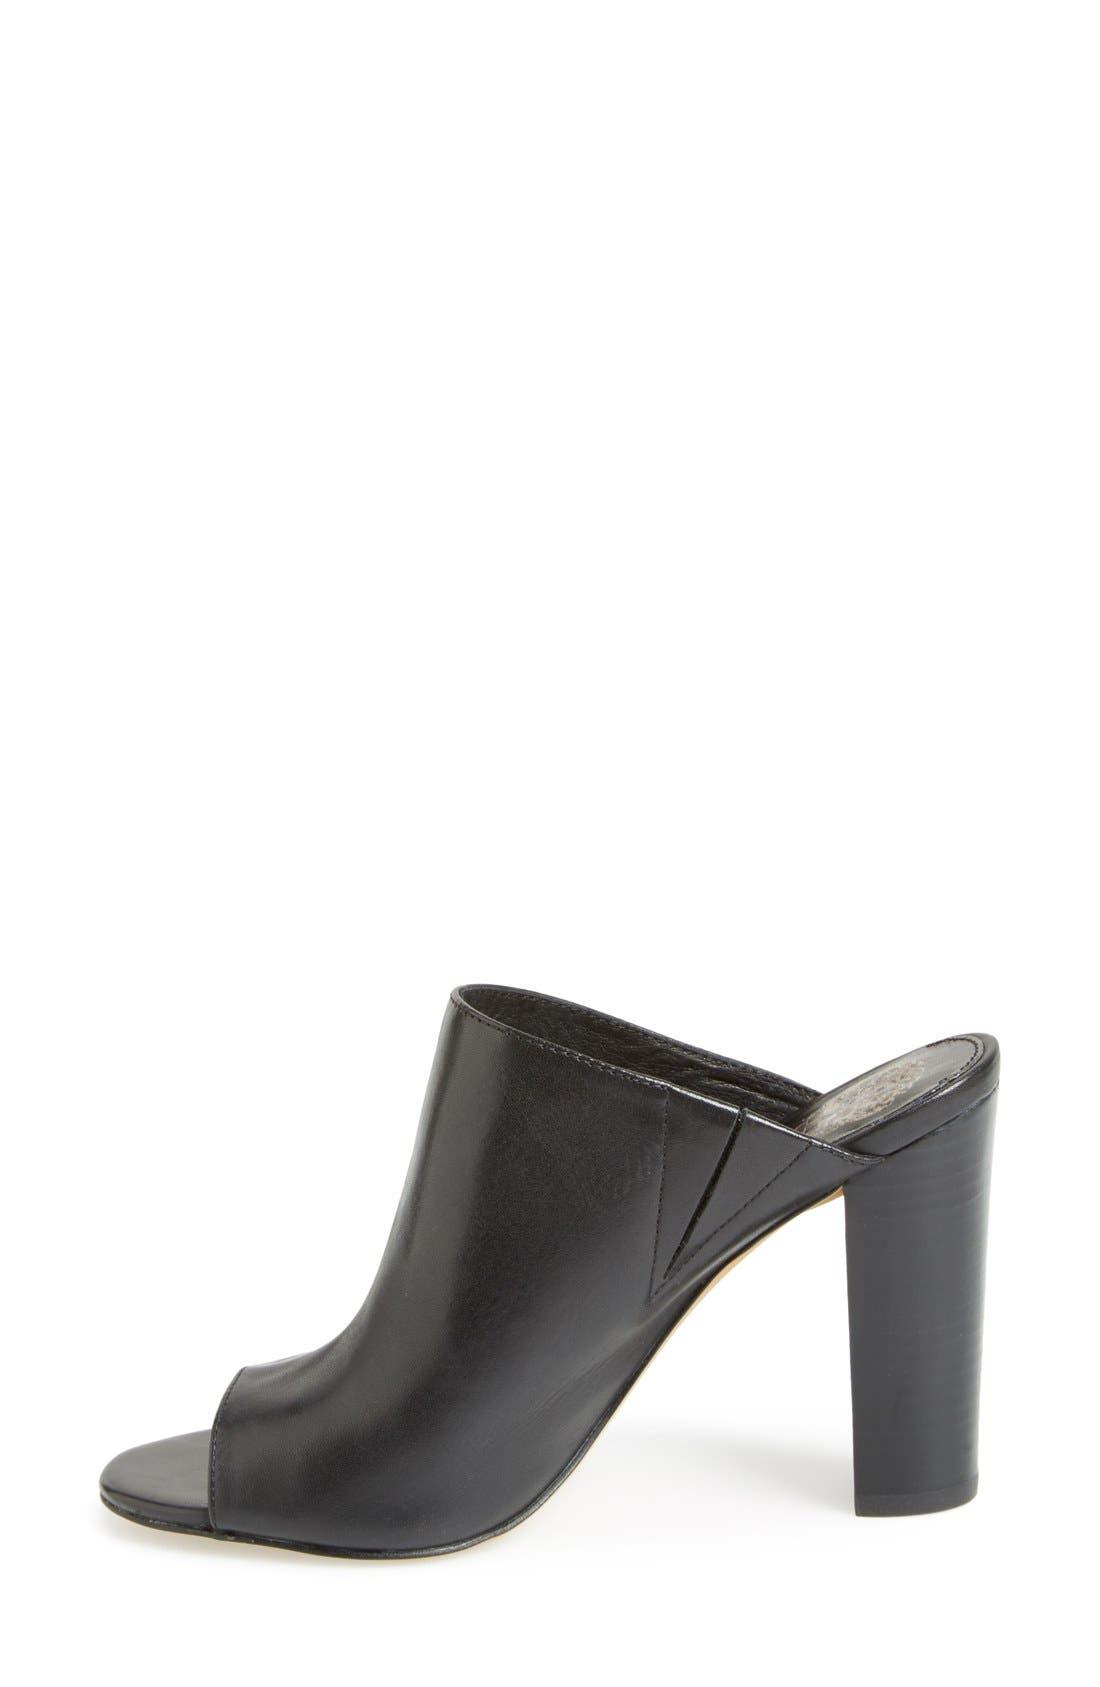 VINCE CAMUTO, 'Vestata' Leather Peep Toe Mule, Alternate thumbnail 3, color, 001